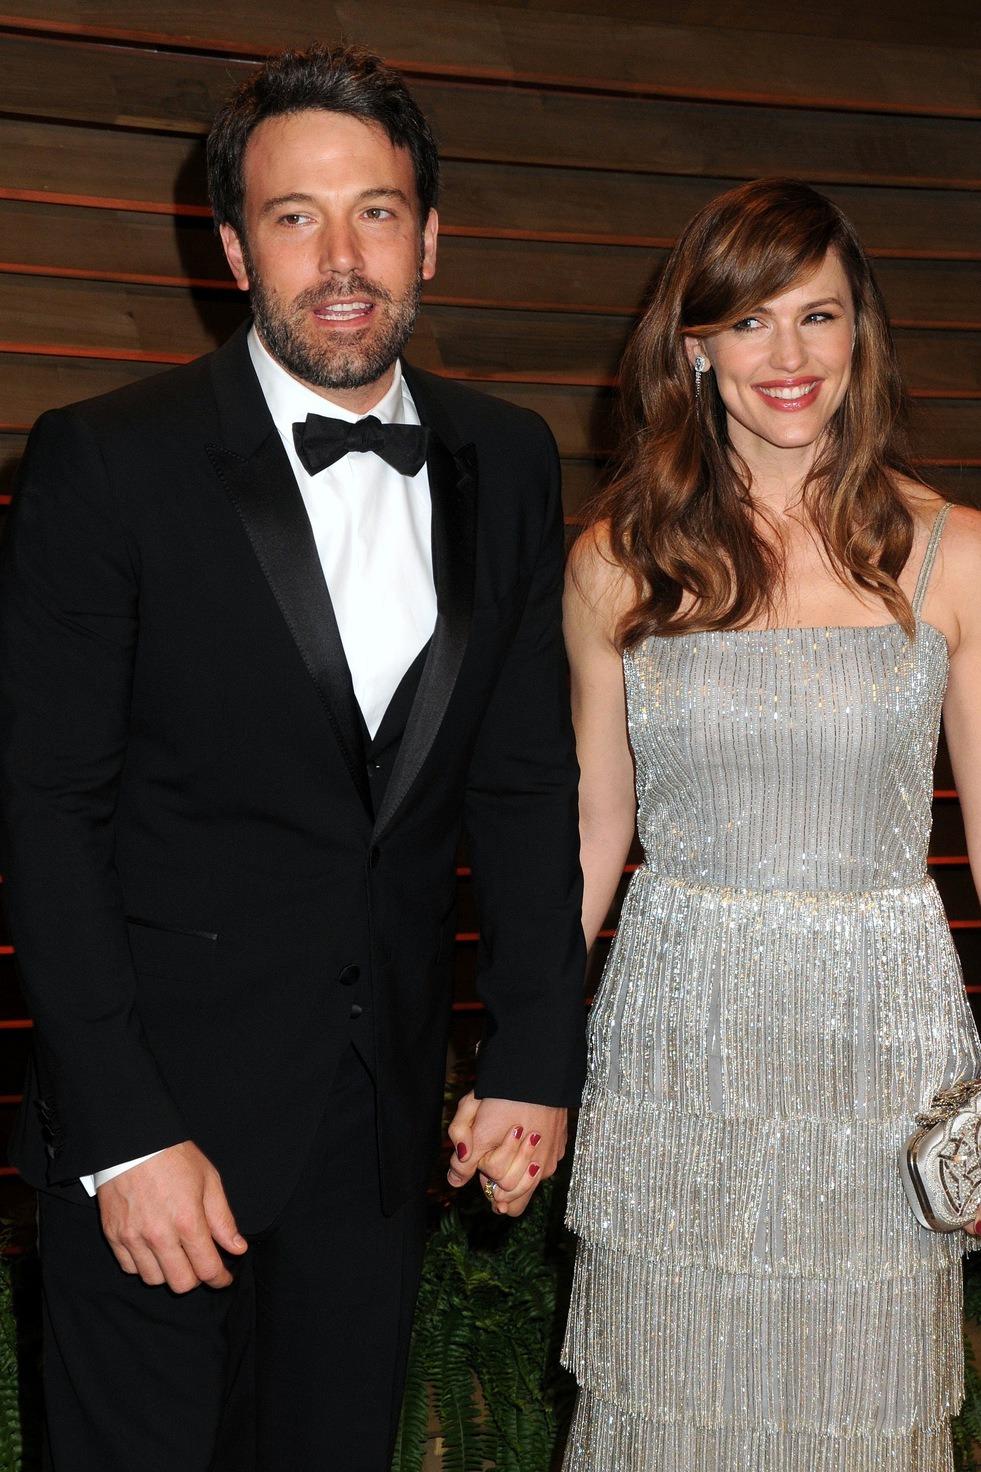 Jennifer Garner és Ben Affleck. Fotó: Sipa USA